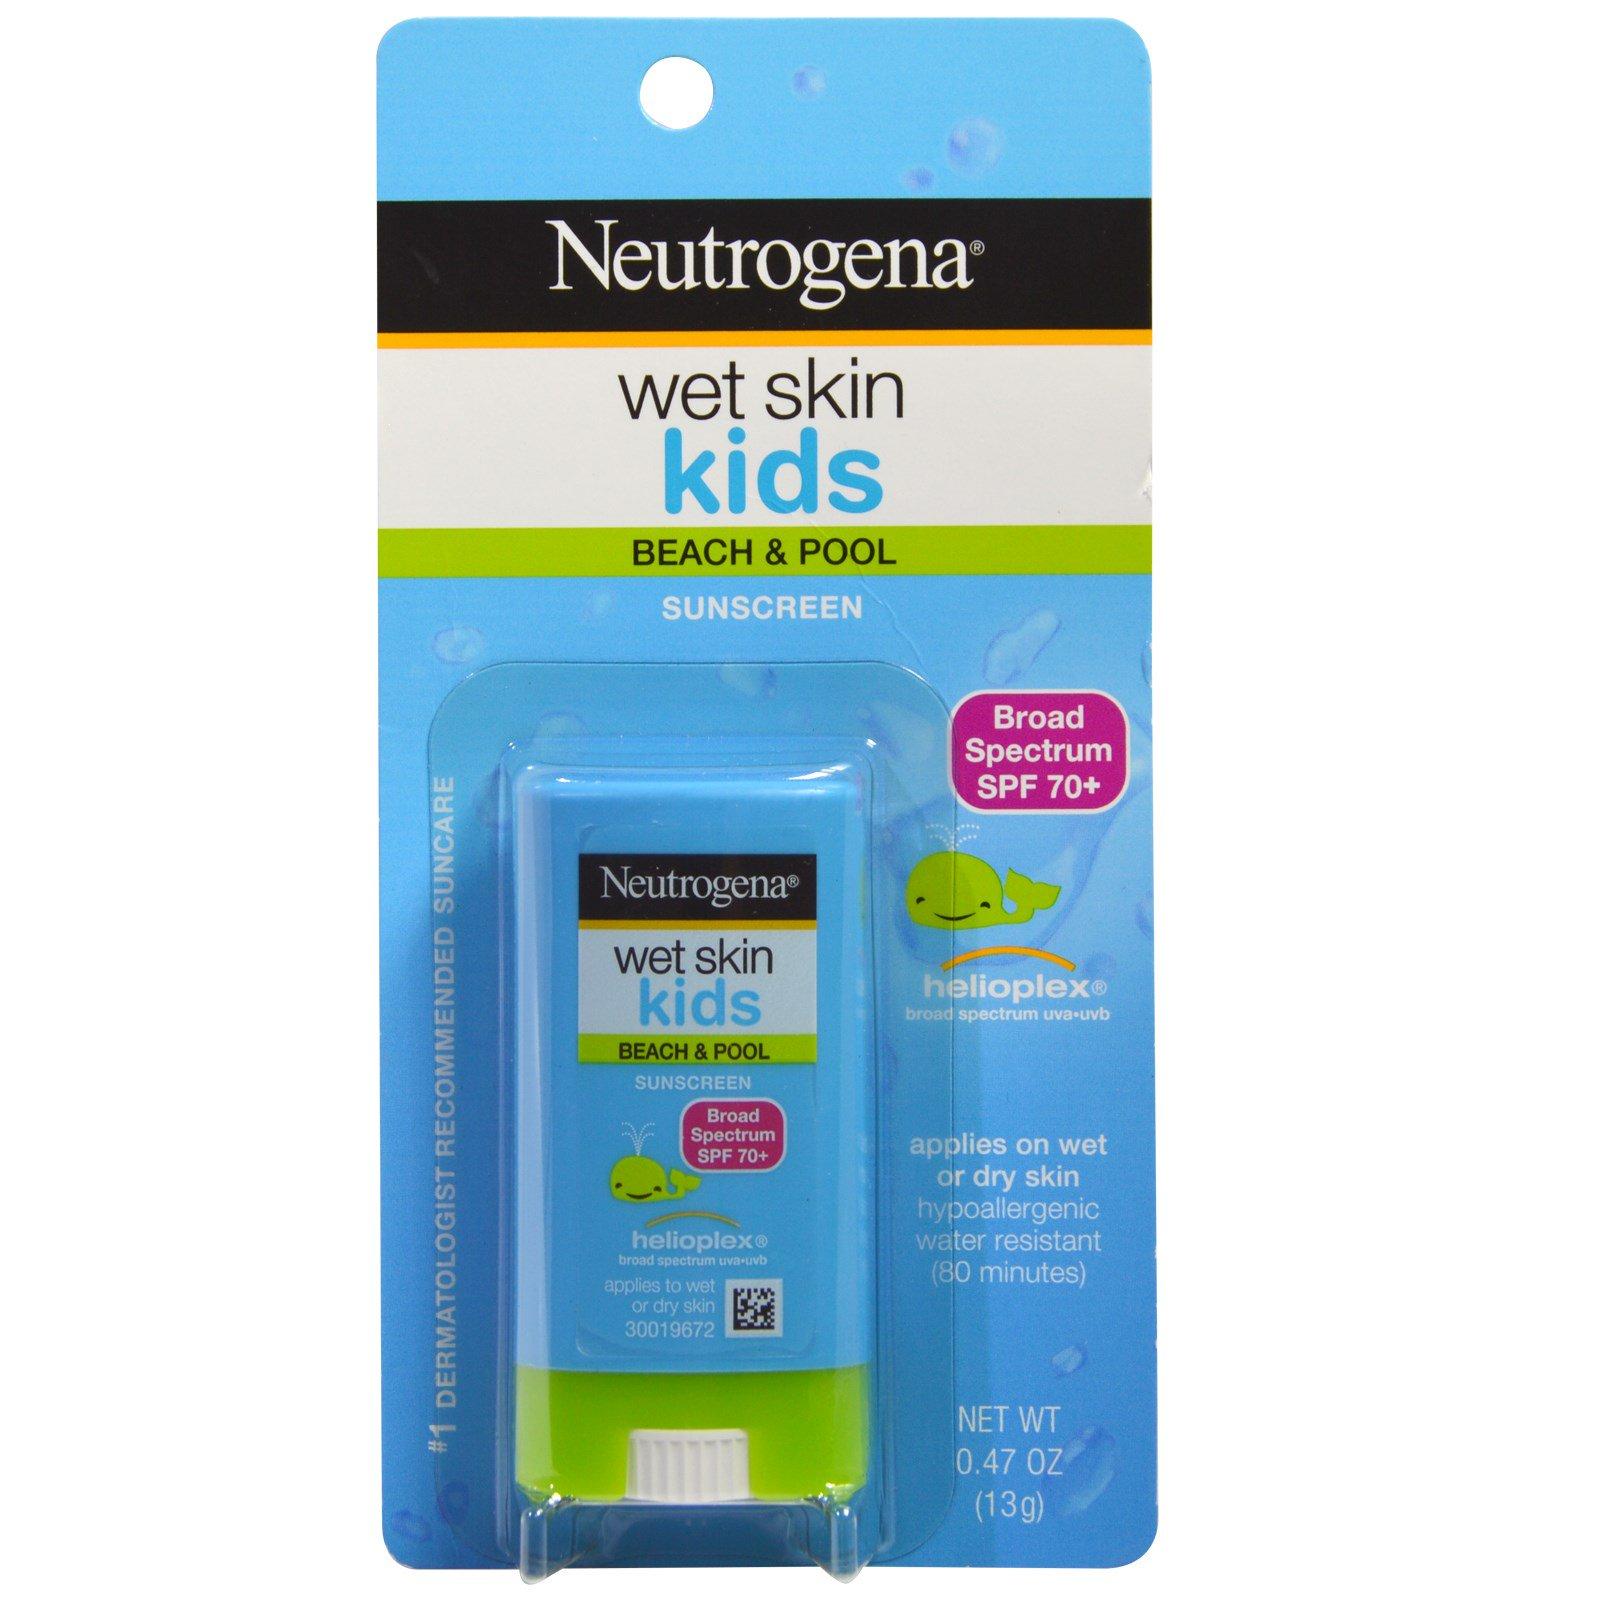 Sunscreen Acnes Uv Tint Spf 35 Neutrogena Wet Skin Kids Beach Pool Stick 70